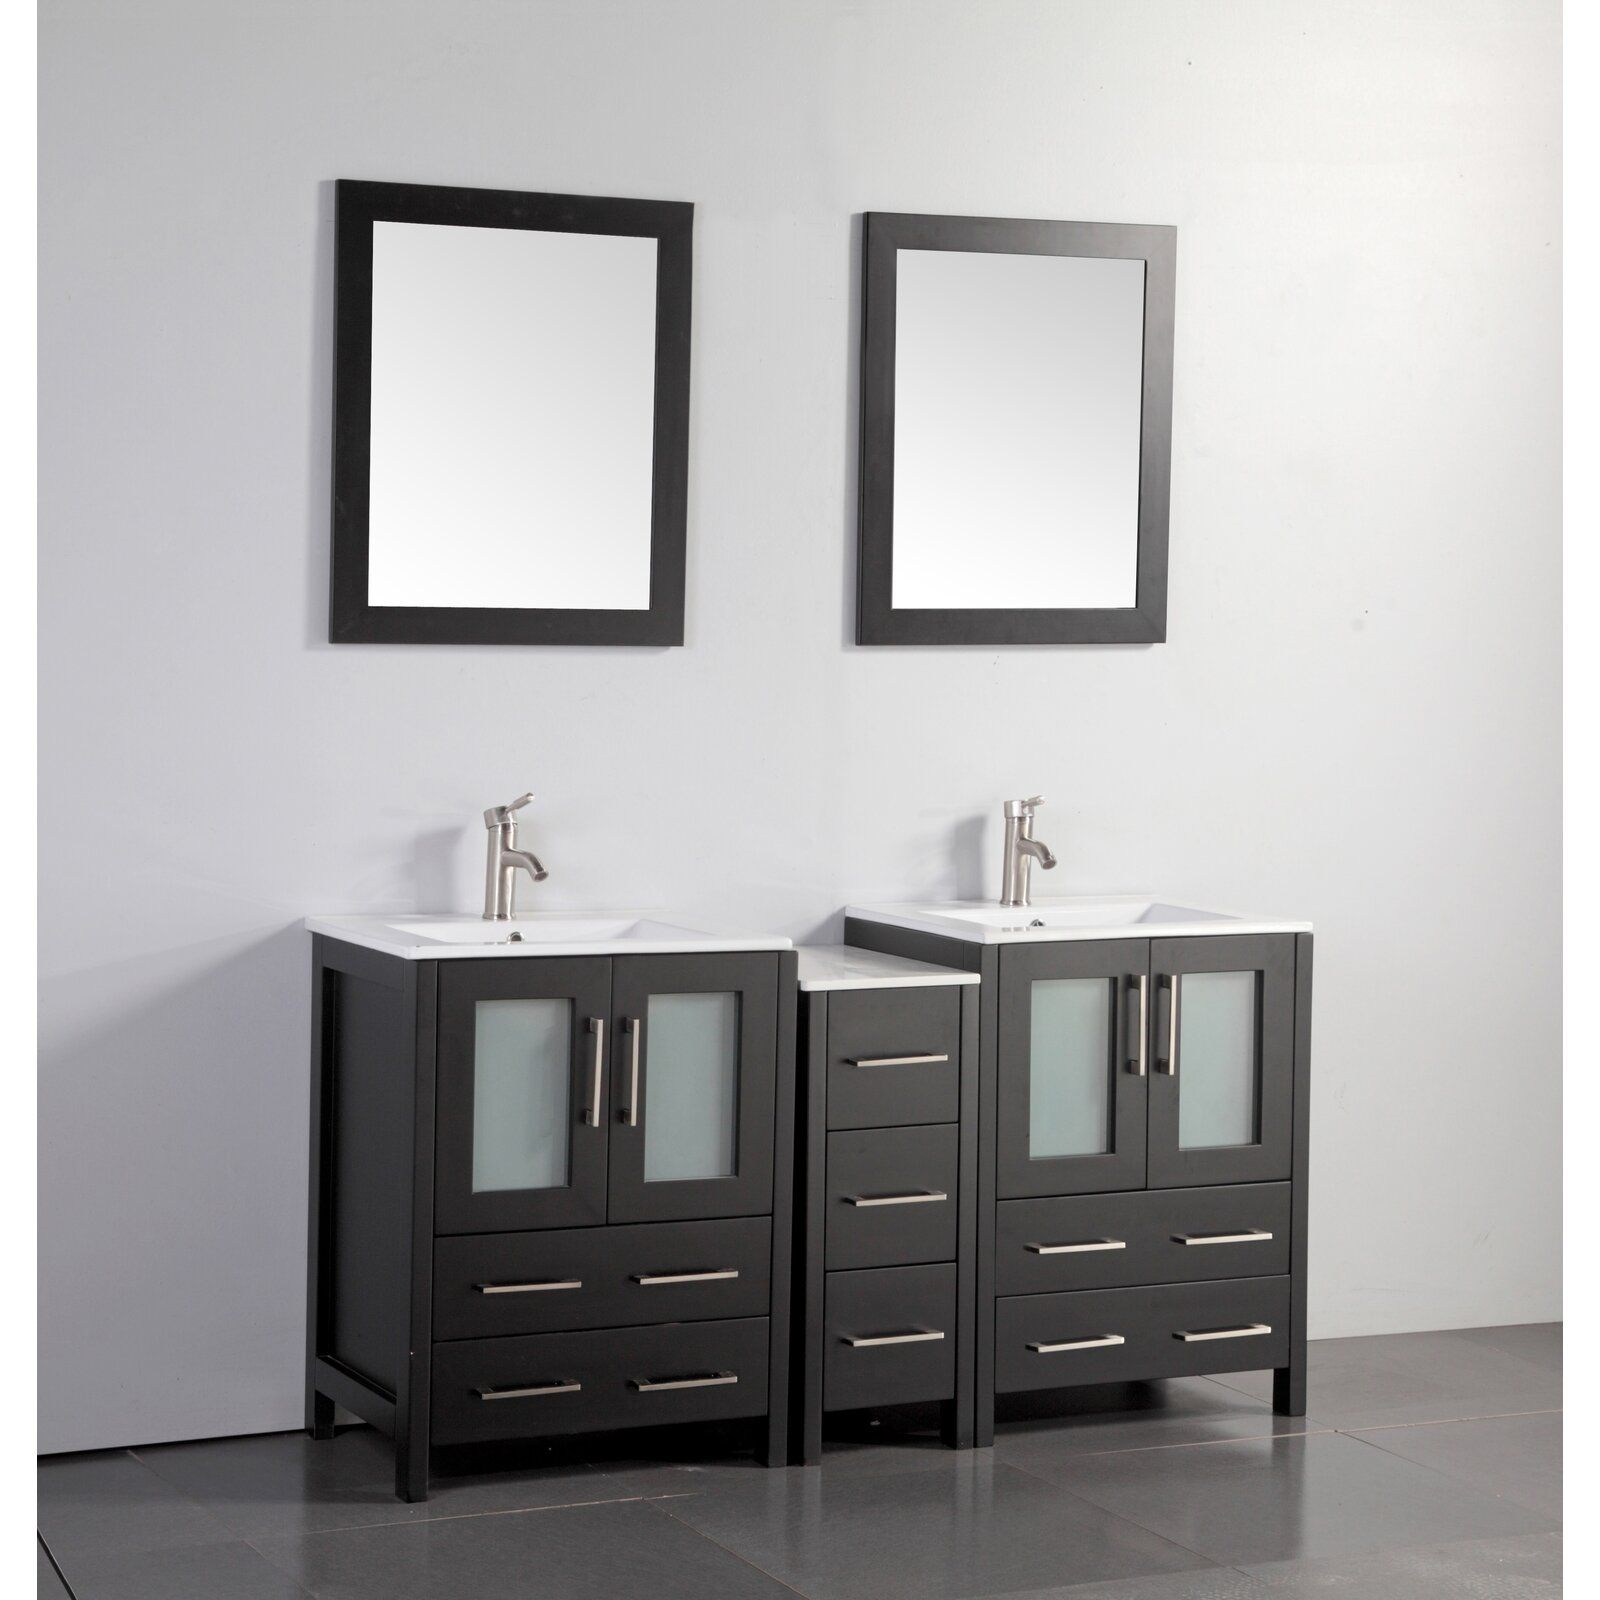 Karson 60 Double Bathroom Vanity Set With Mirror In 2019 Columns